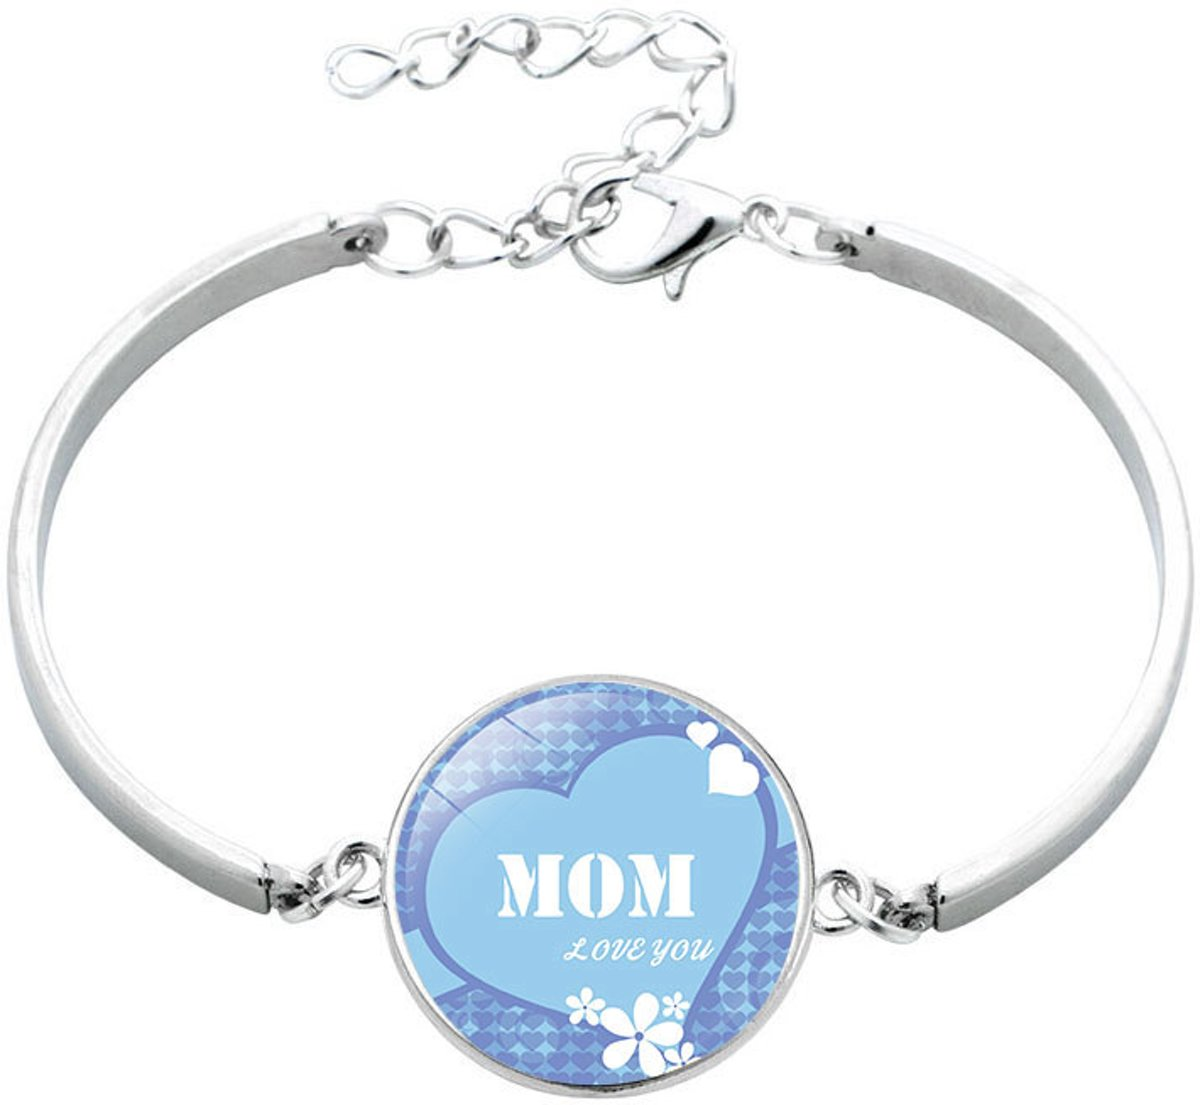 Unieke mama armband - armband Mom - valentijnscadeau mama - speciale armband voor mama - moeder cadeau - verjaardagscadeau mama kopen